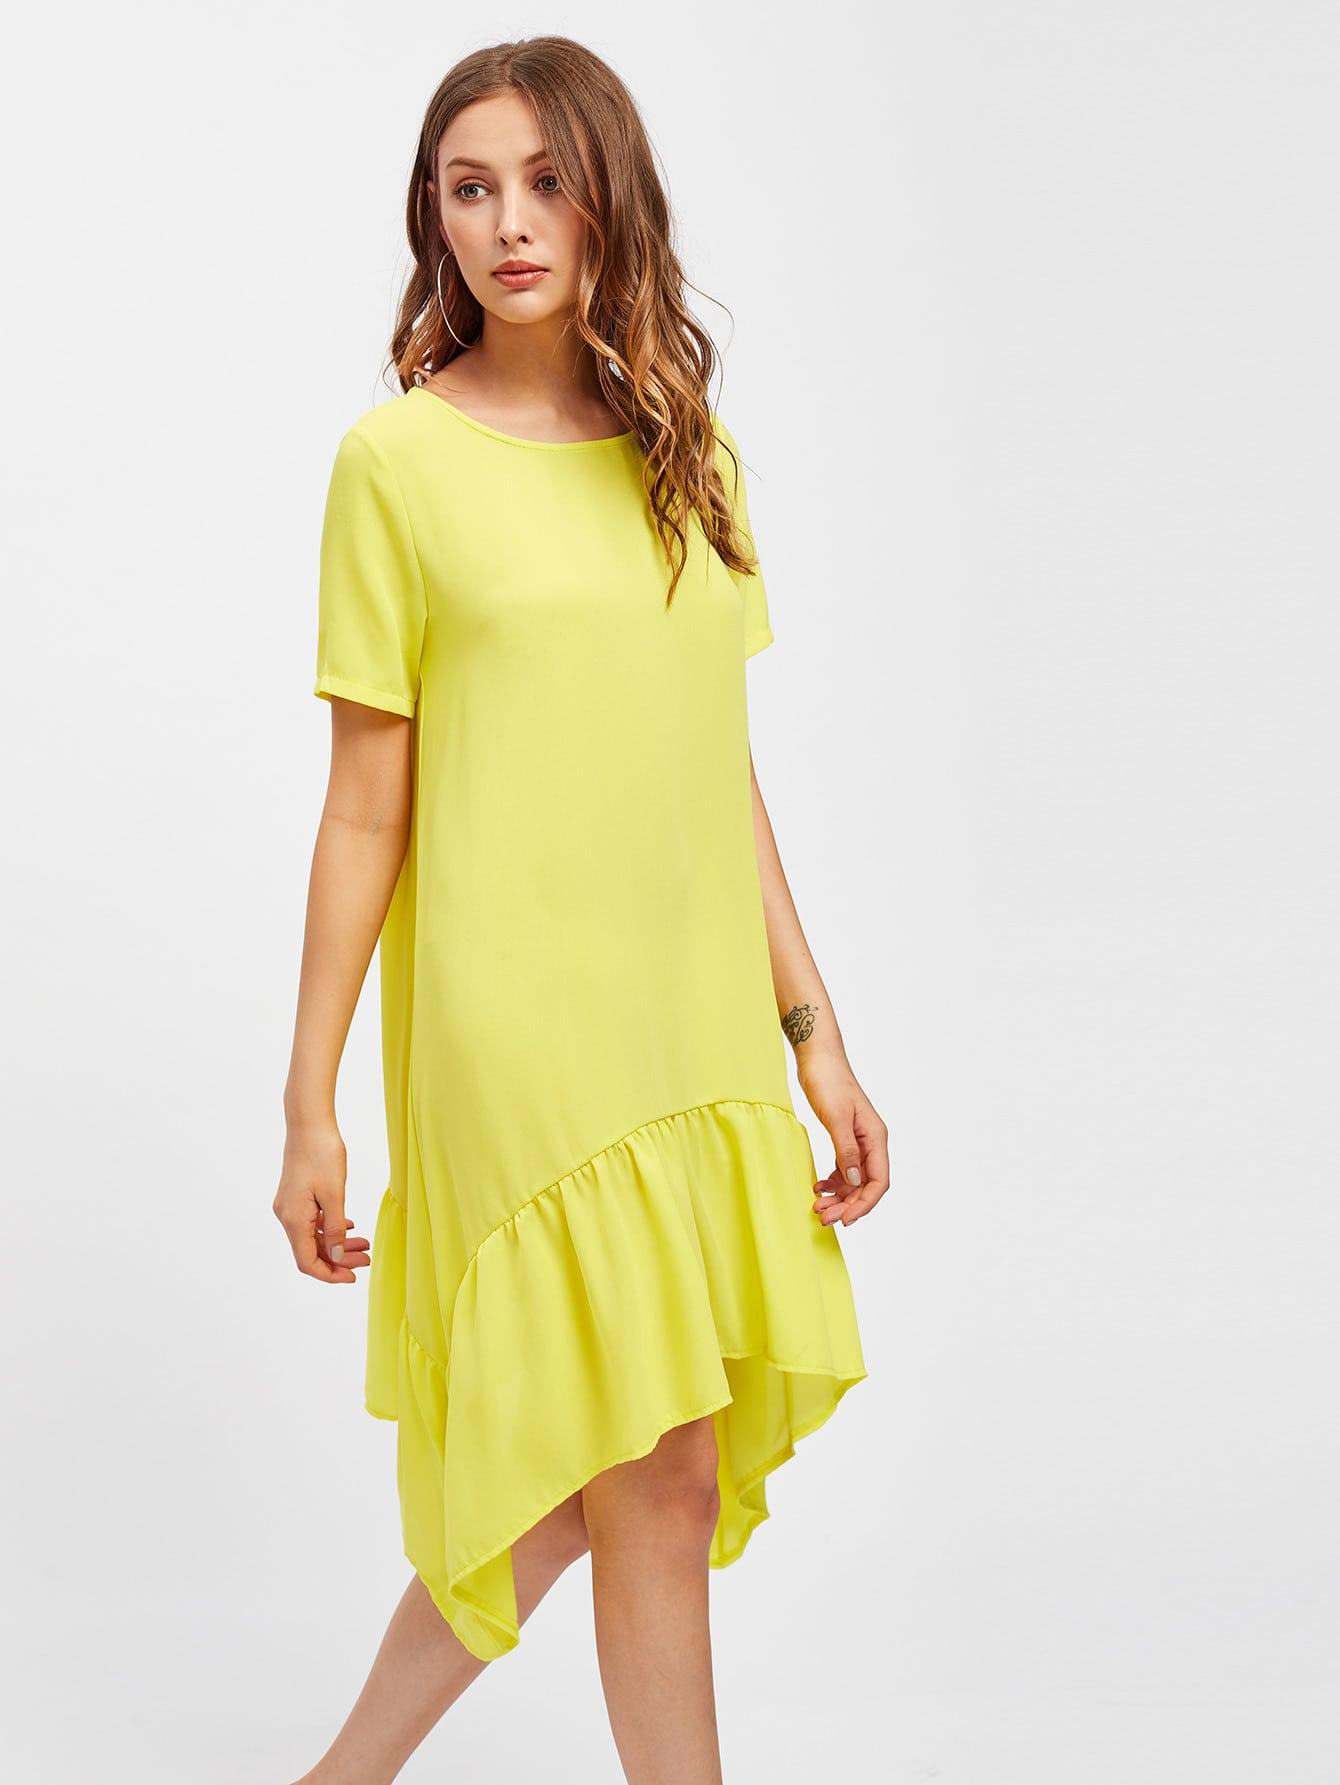 Asymmetrical Frill Hem Tee Dress